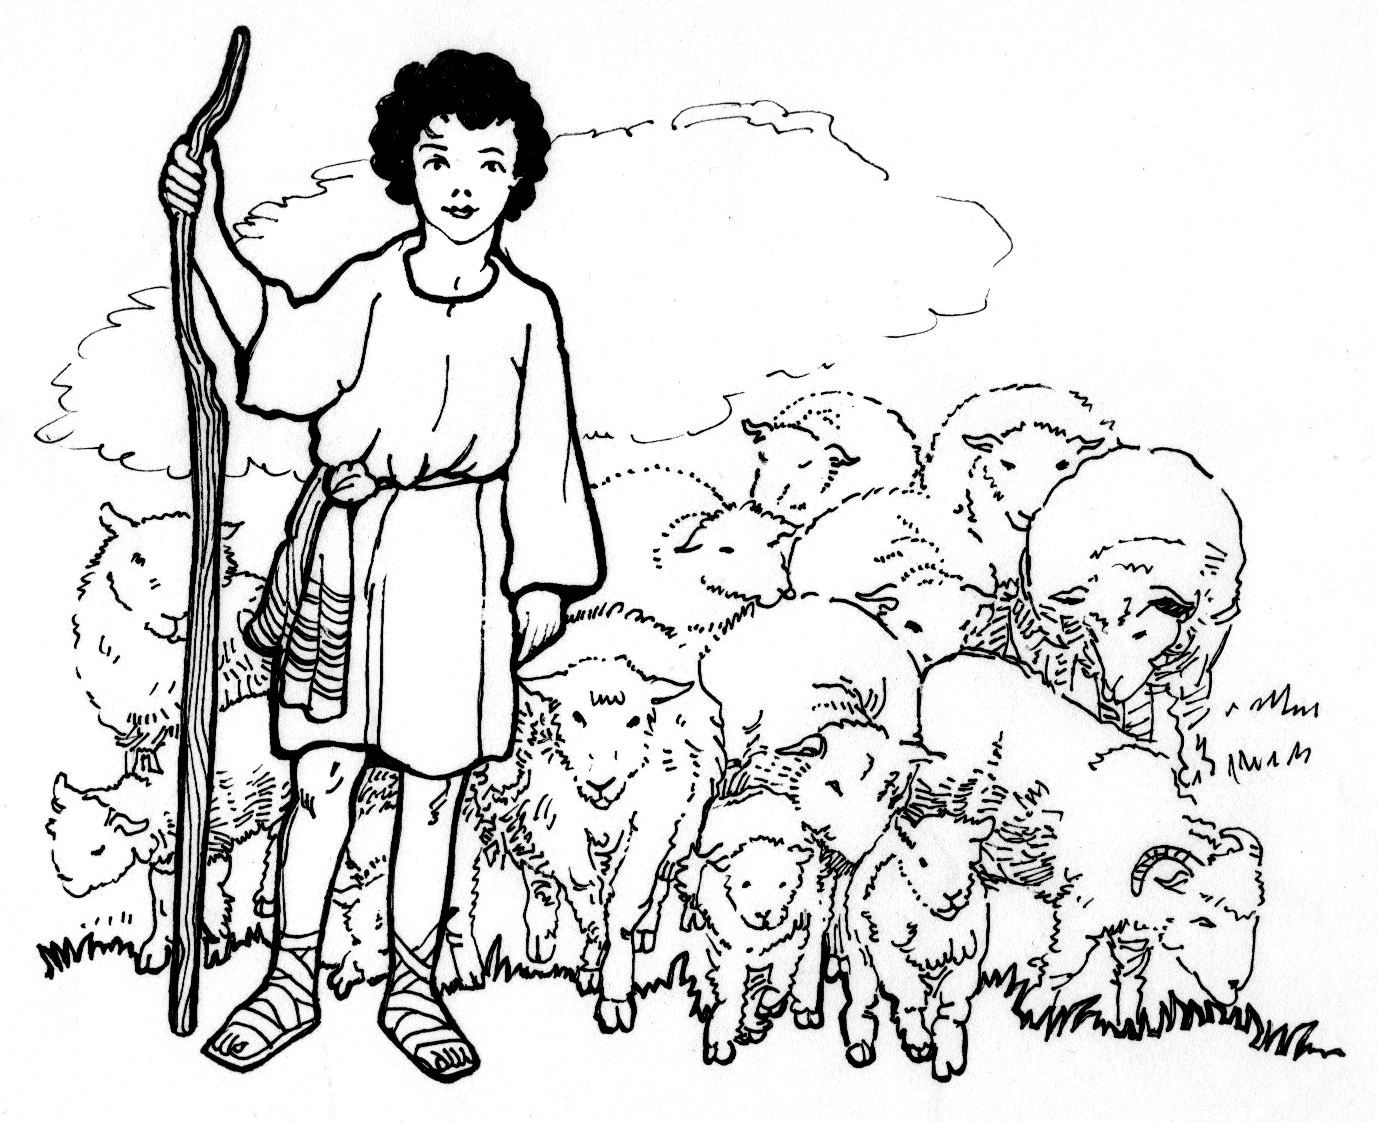 1377x1122 David The Shepherd Boy Coloring Page Download